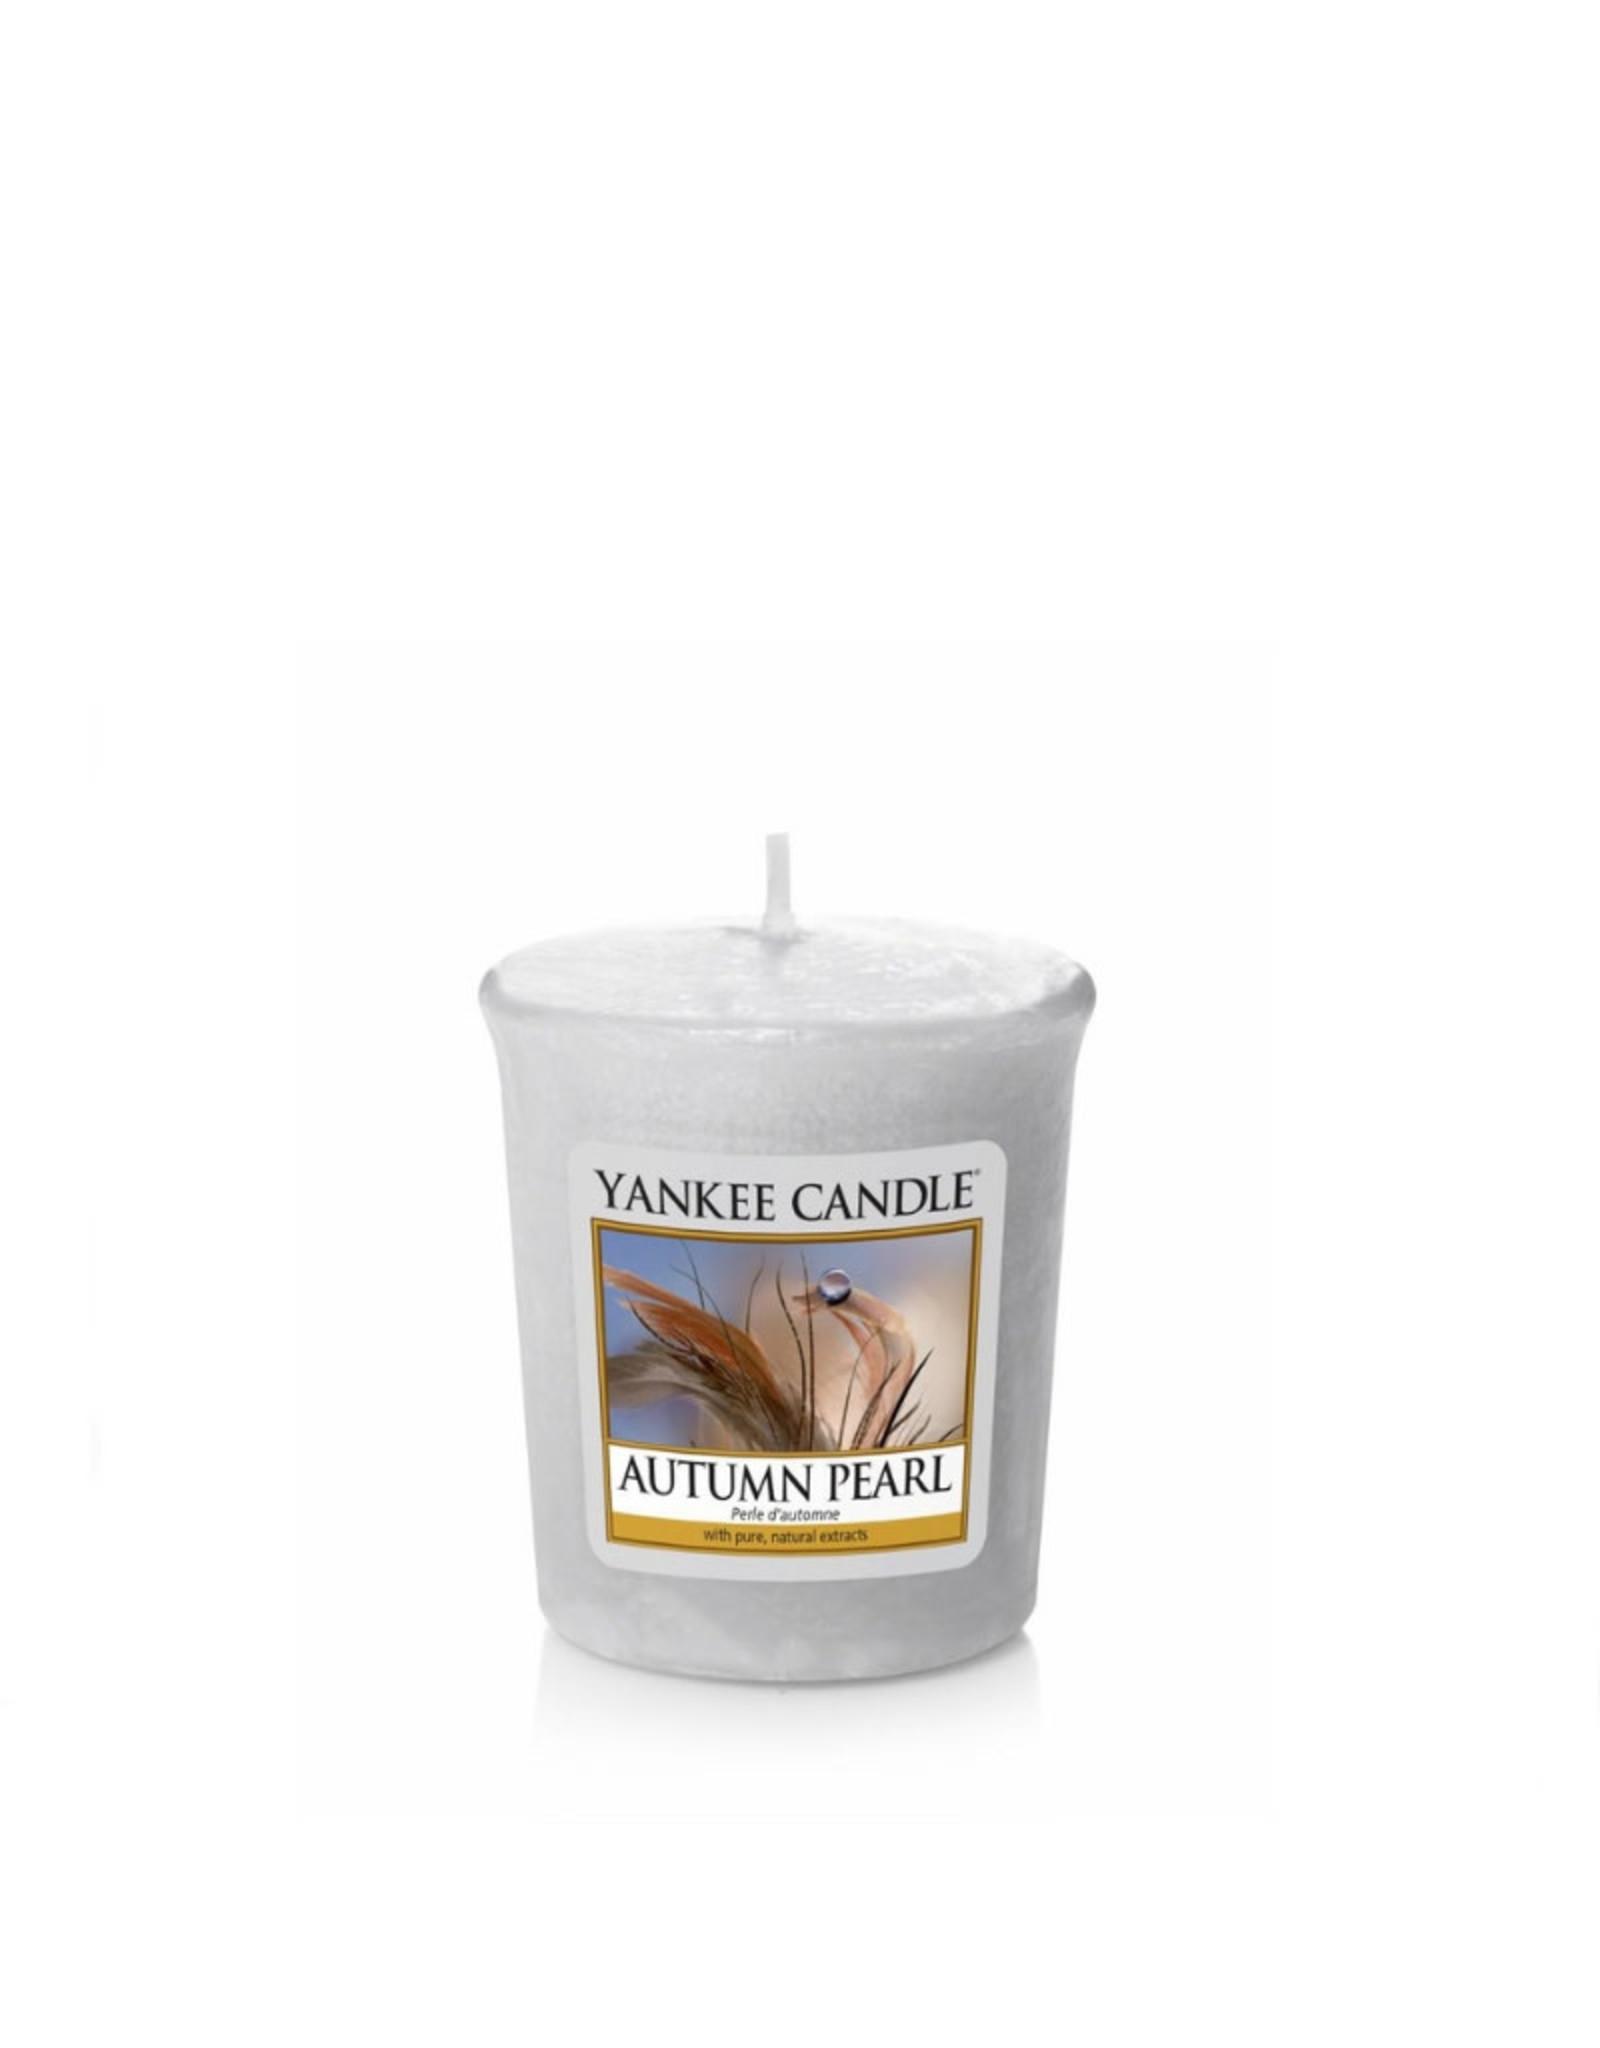 Yankee Candle Autumn Pearl Votive